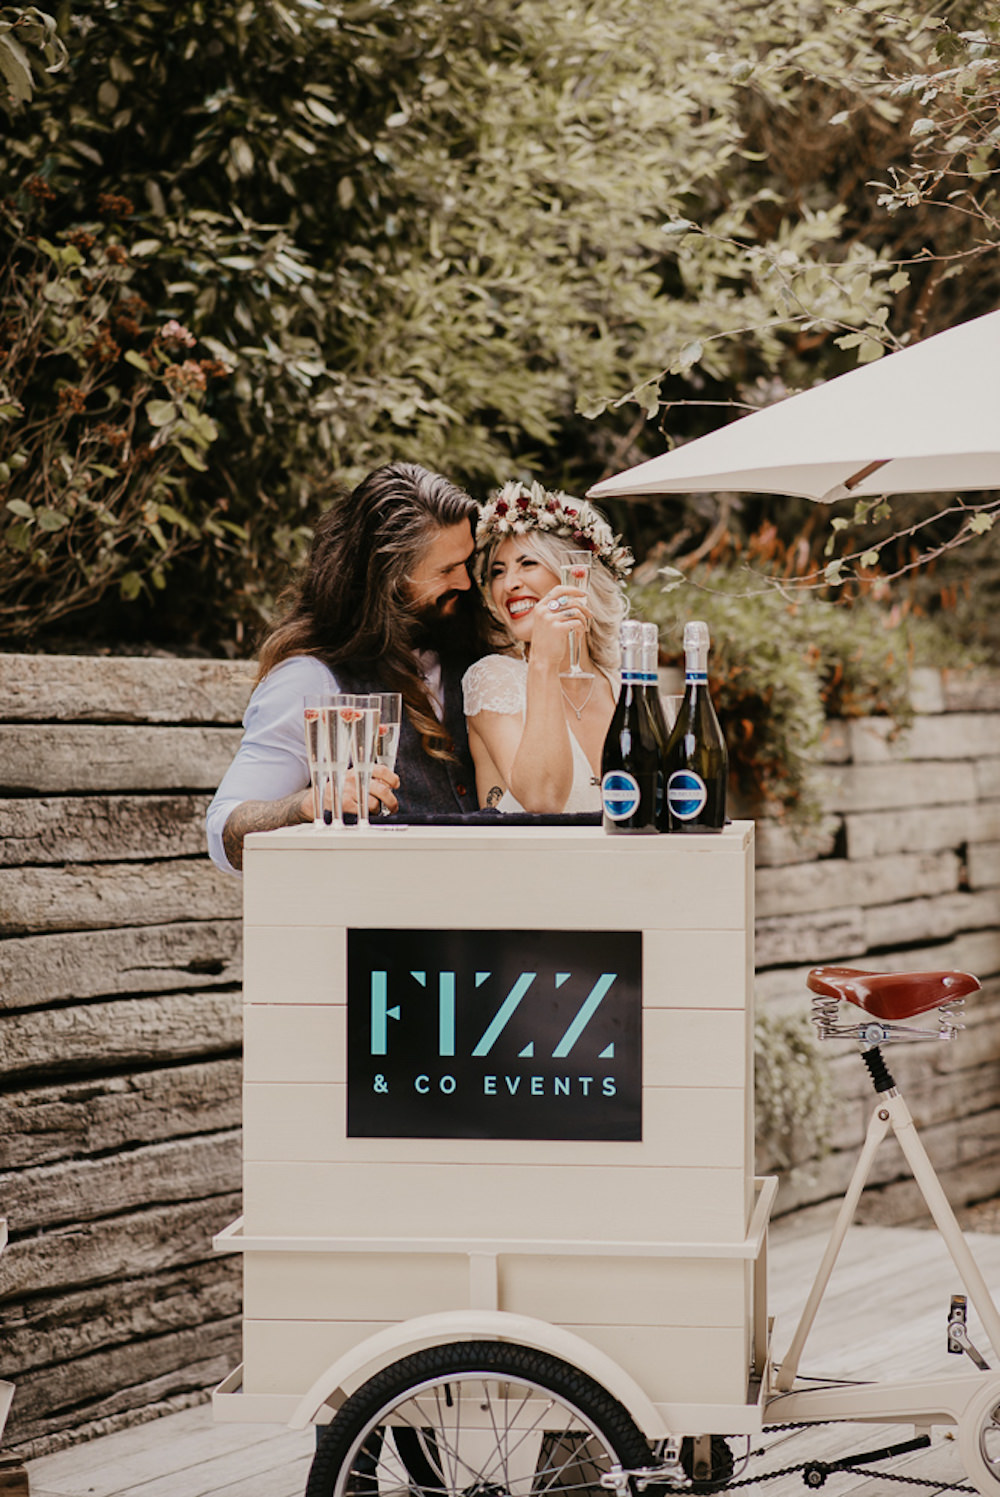 Drink Trike Bar Stand Station Unconventional Wedding Ideas Pierra G Photography